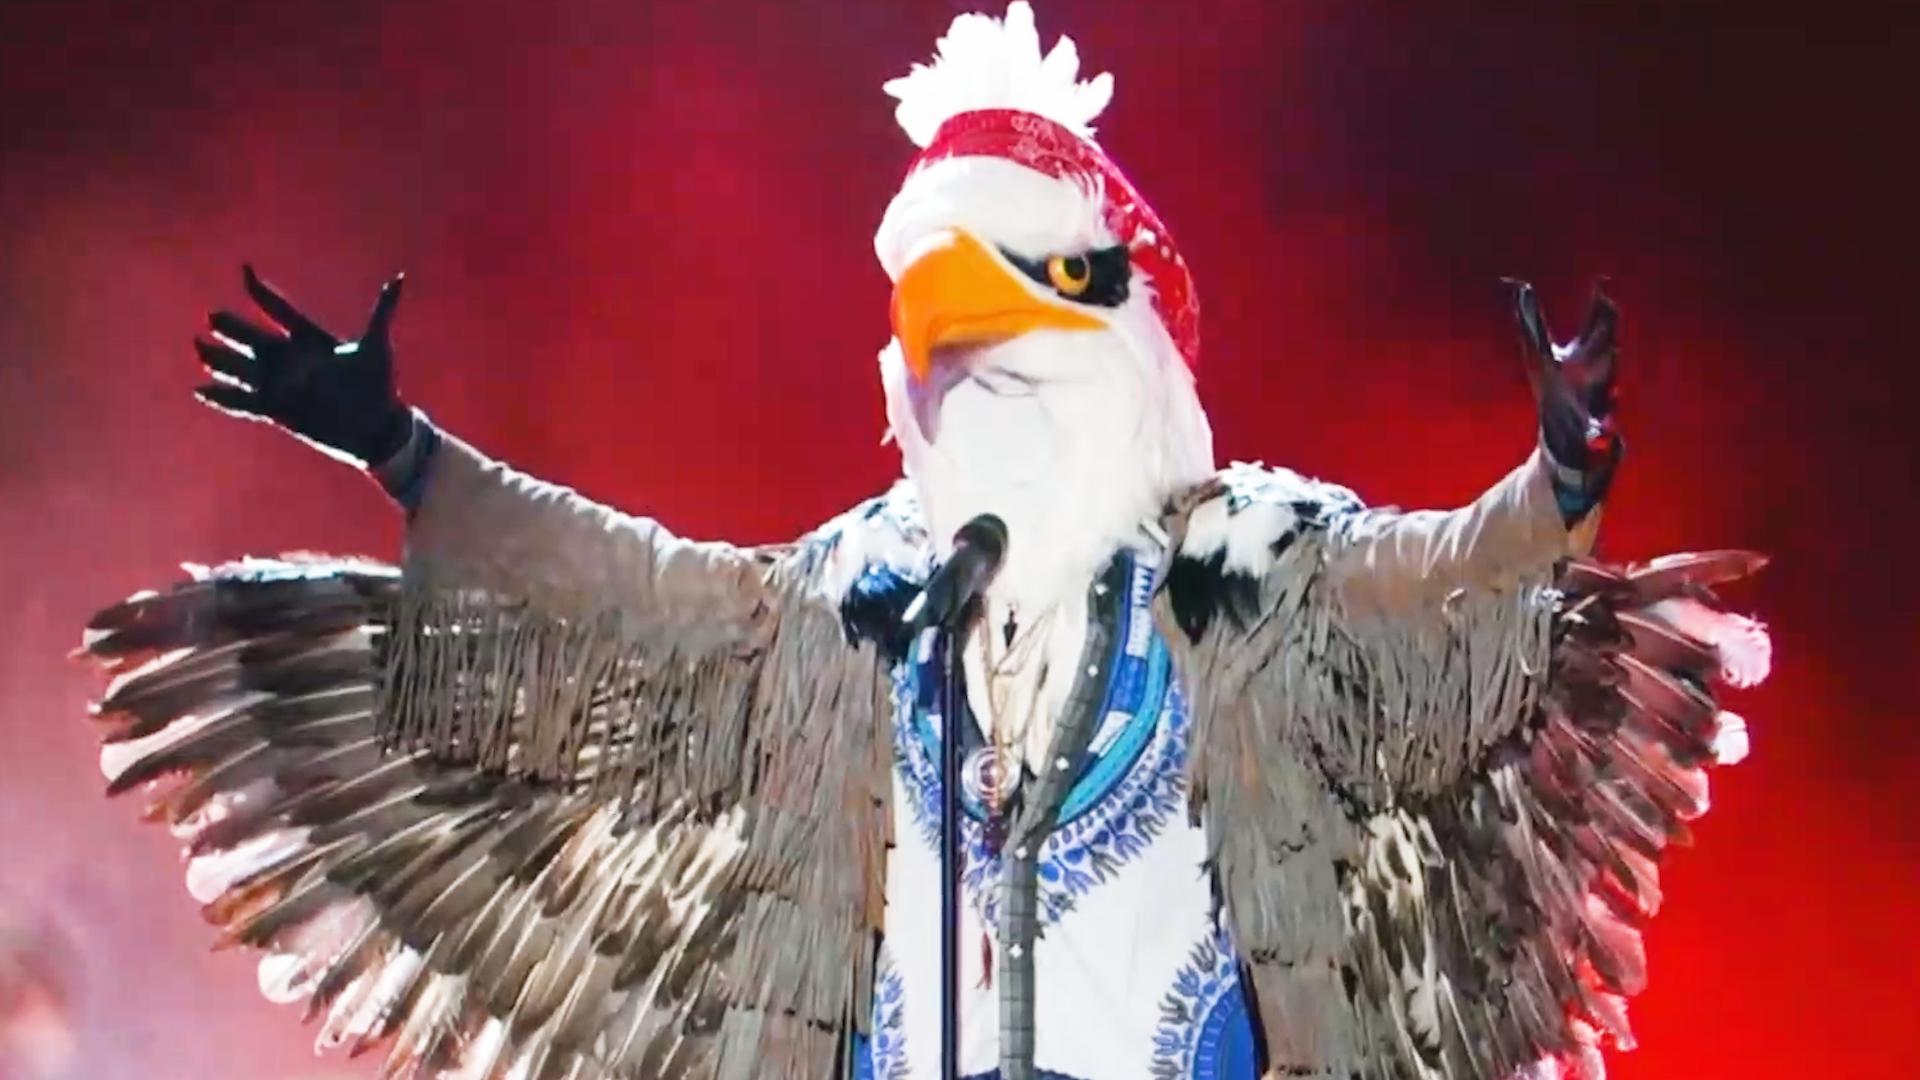 Fans legitimately surprised by talk show host being unmasked on 'Masked Singer'